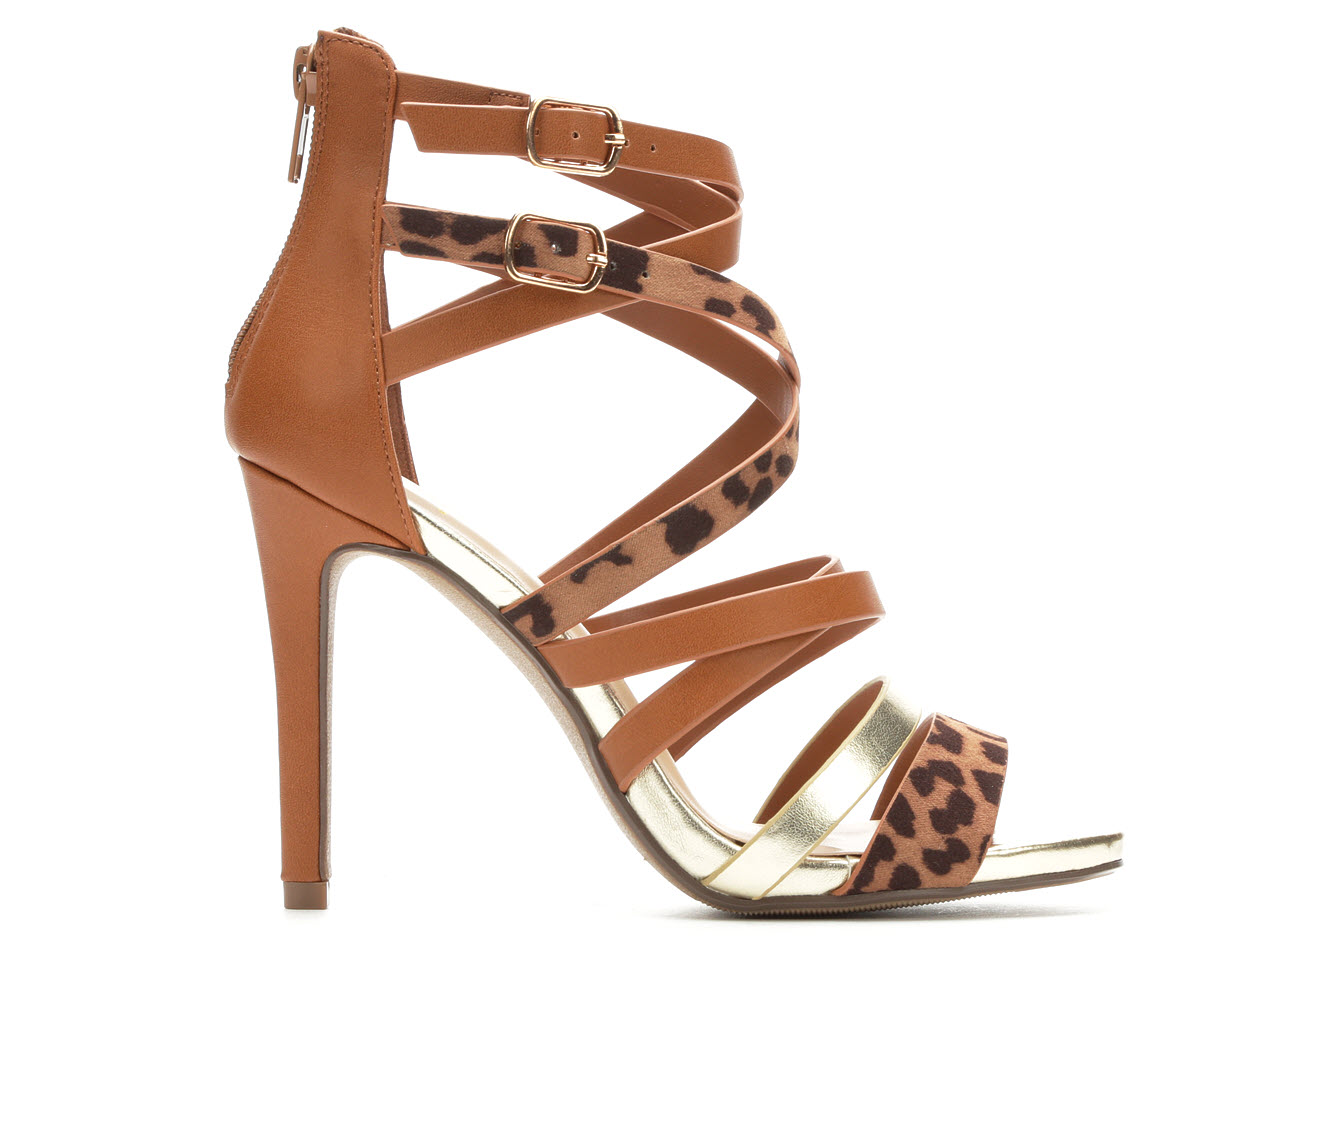 Delicious Cage Women's Dress Shoe (Beige Faux Leather)